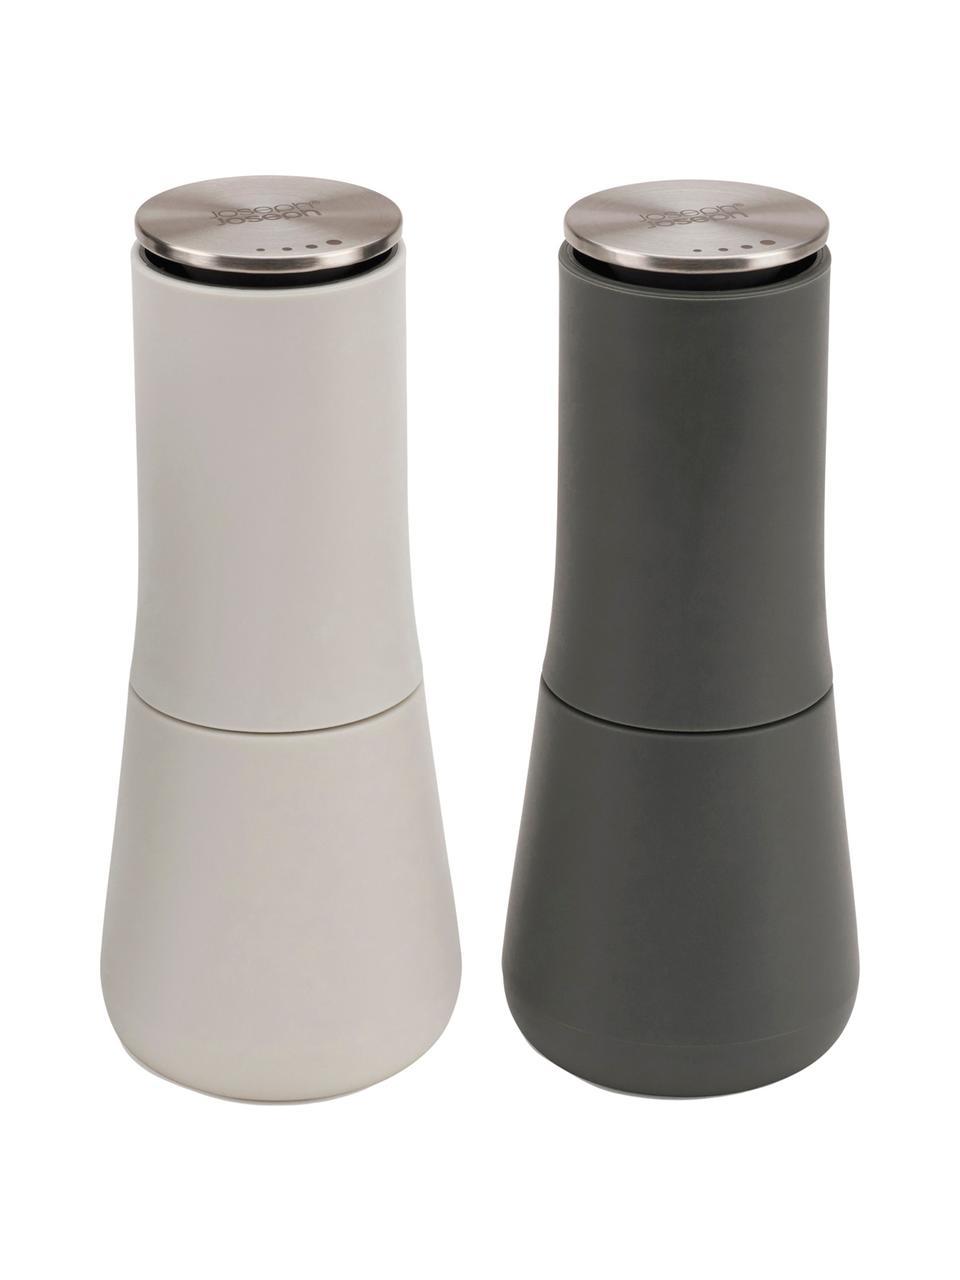 Salz- und Pfeffermühlen-Set Milltop, 2-tlg., Korpus: Kunststoff (TPE und ABS),, Mahlwerk: Keramik, Deckel: Edelstahl, Grau, Dunkelgrau, Ø 7 x H 17 cm